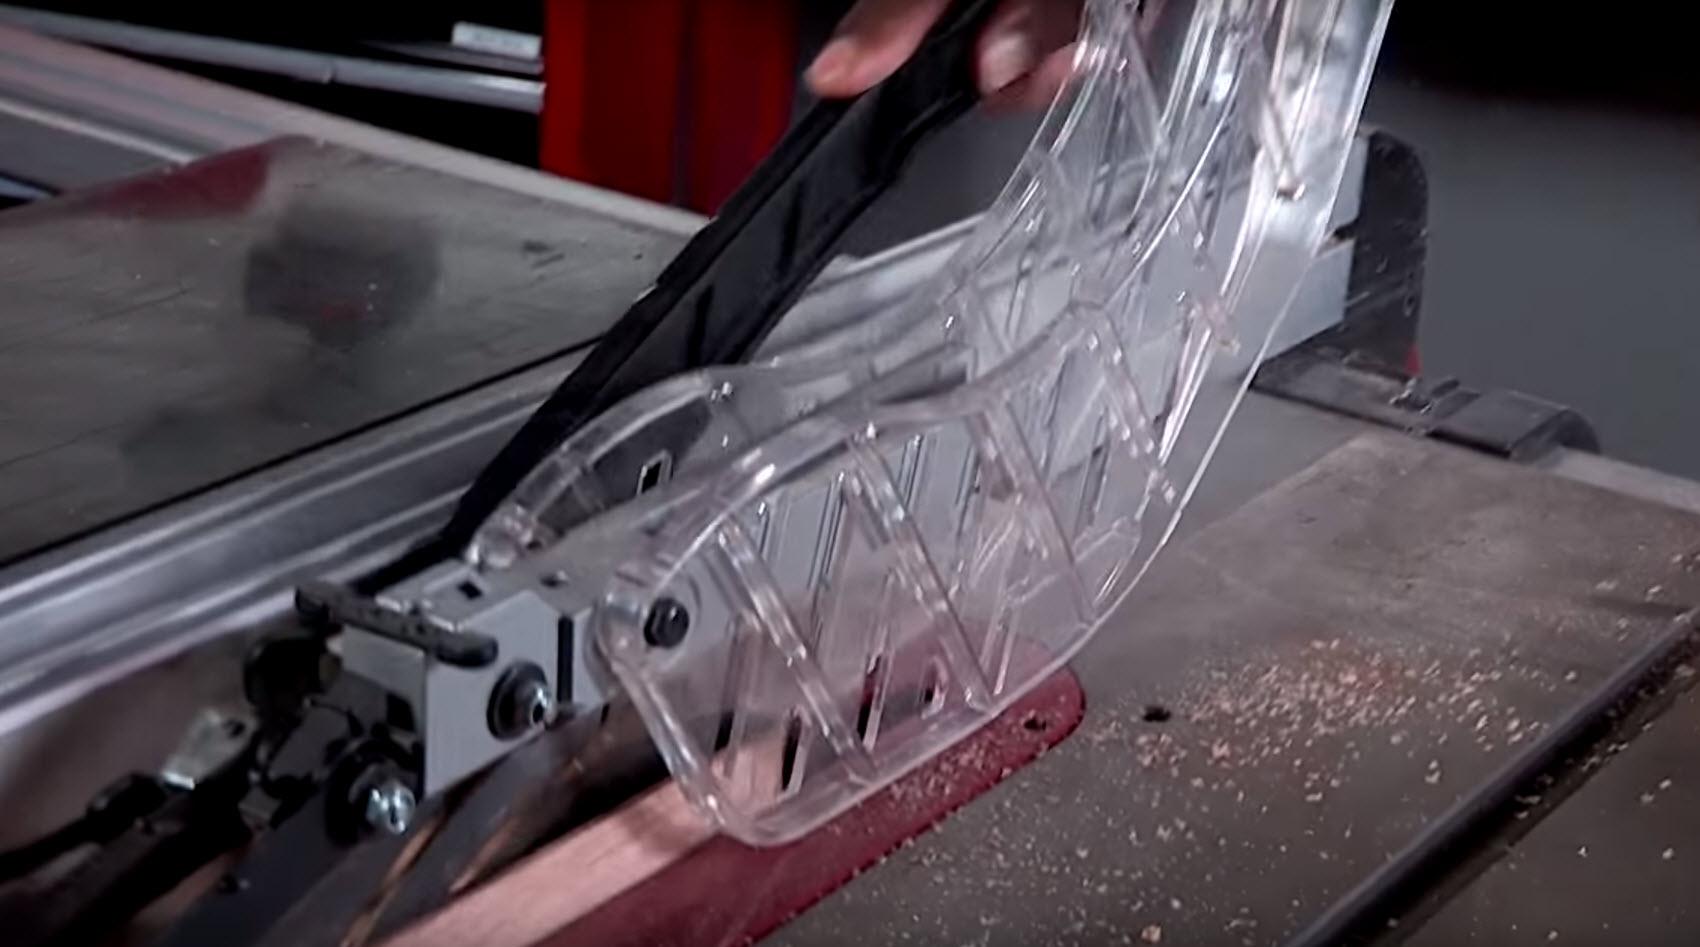 DIY table saw repair | Table saw troubleshooting